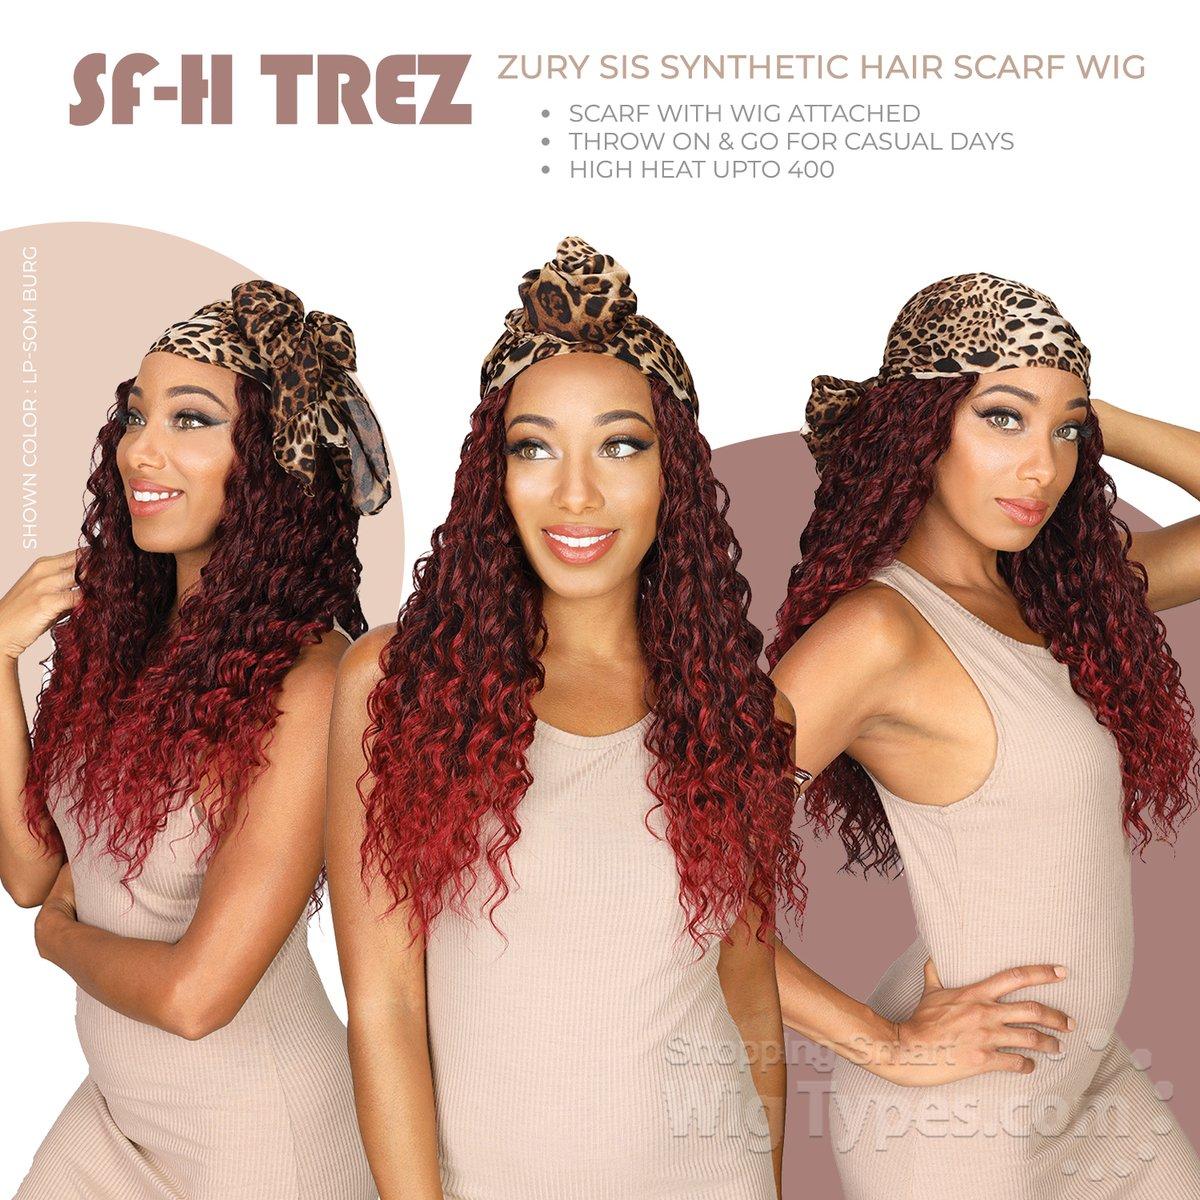 Zury Sis Synthetic Hair Scarf Wig - SF-H TREZ (https://soo.nr/qSKr)    Shown Color : LP-SOM BURG . . . . #wigtypes #wigtypesdotcom #trendywig #protectivestyles #blackgirlhair #blackgirlmagic #instahair #Longwigs #scarfwig #zurysis #scarfwithwigattached #sfhtrezpic.twitter.com/QFuqTHi4hM